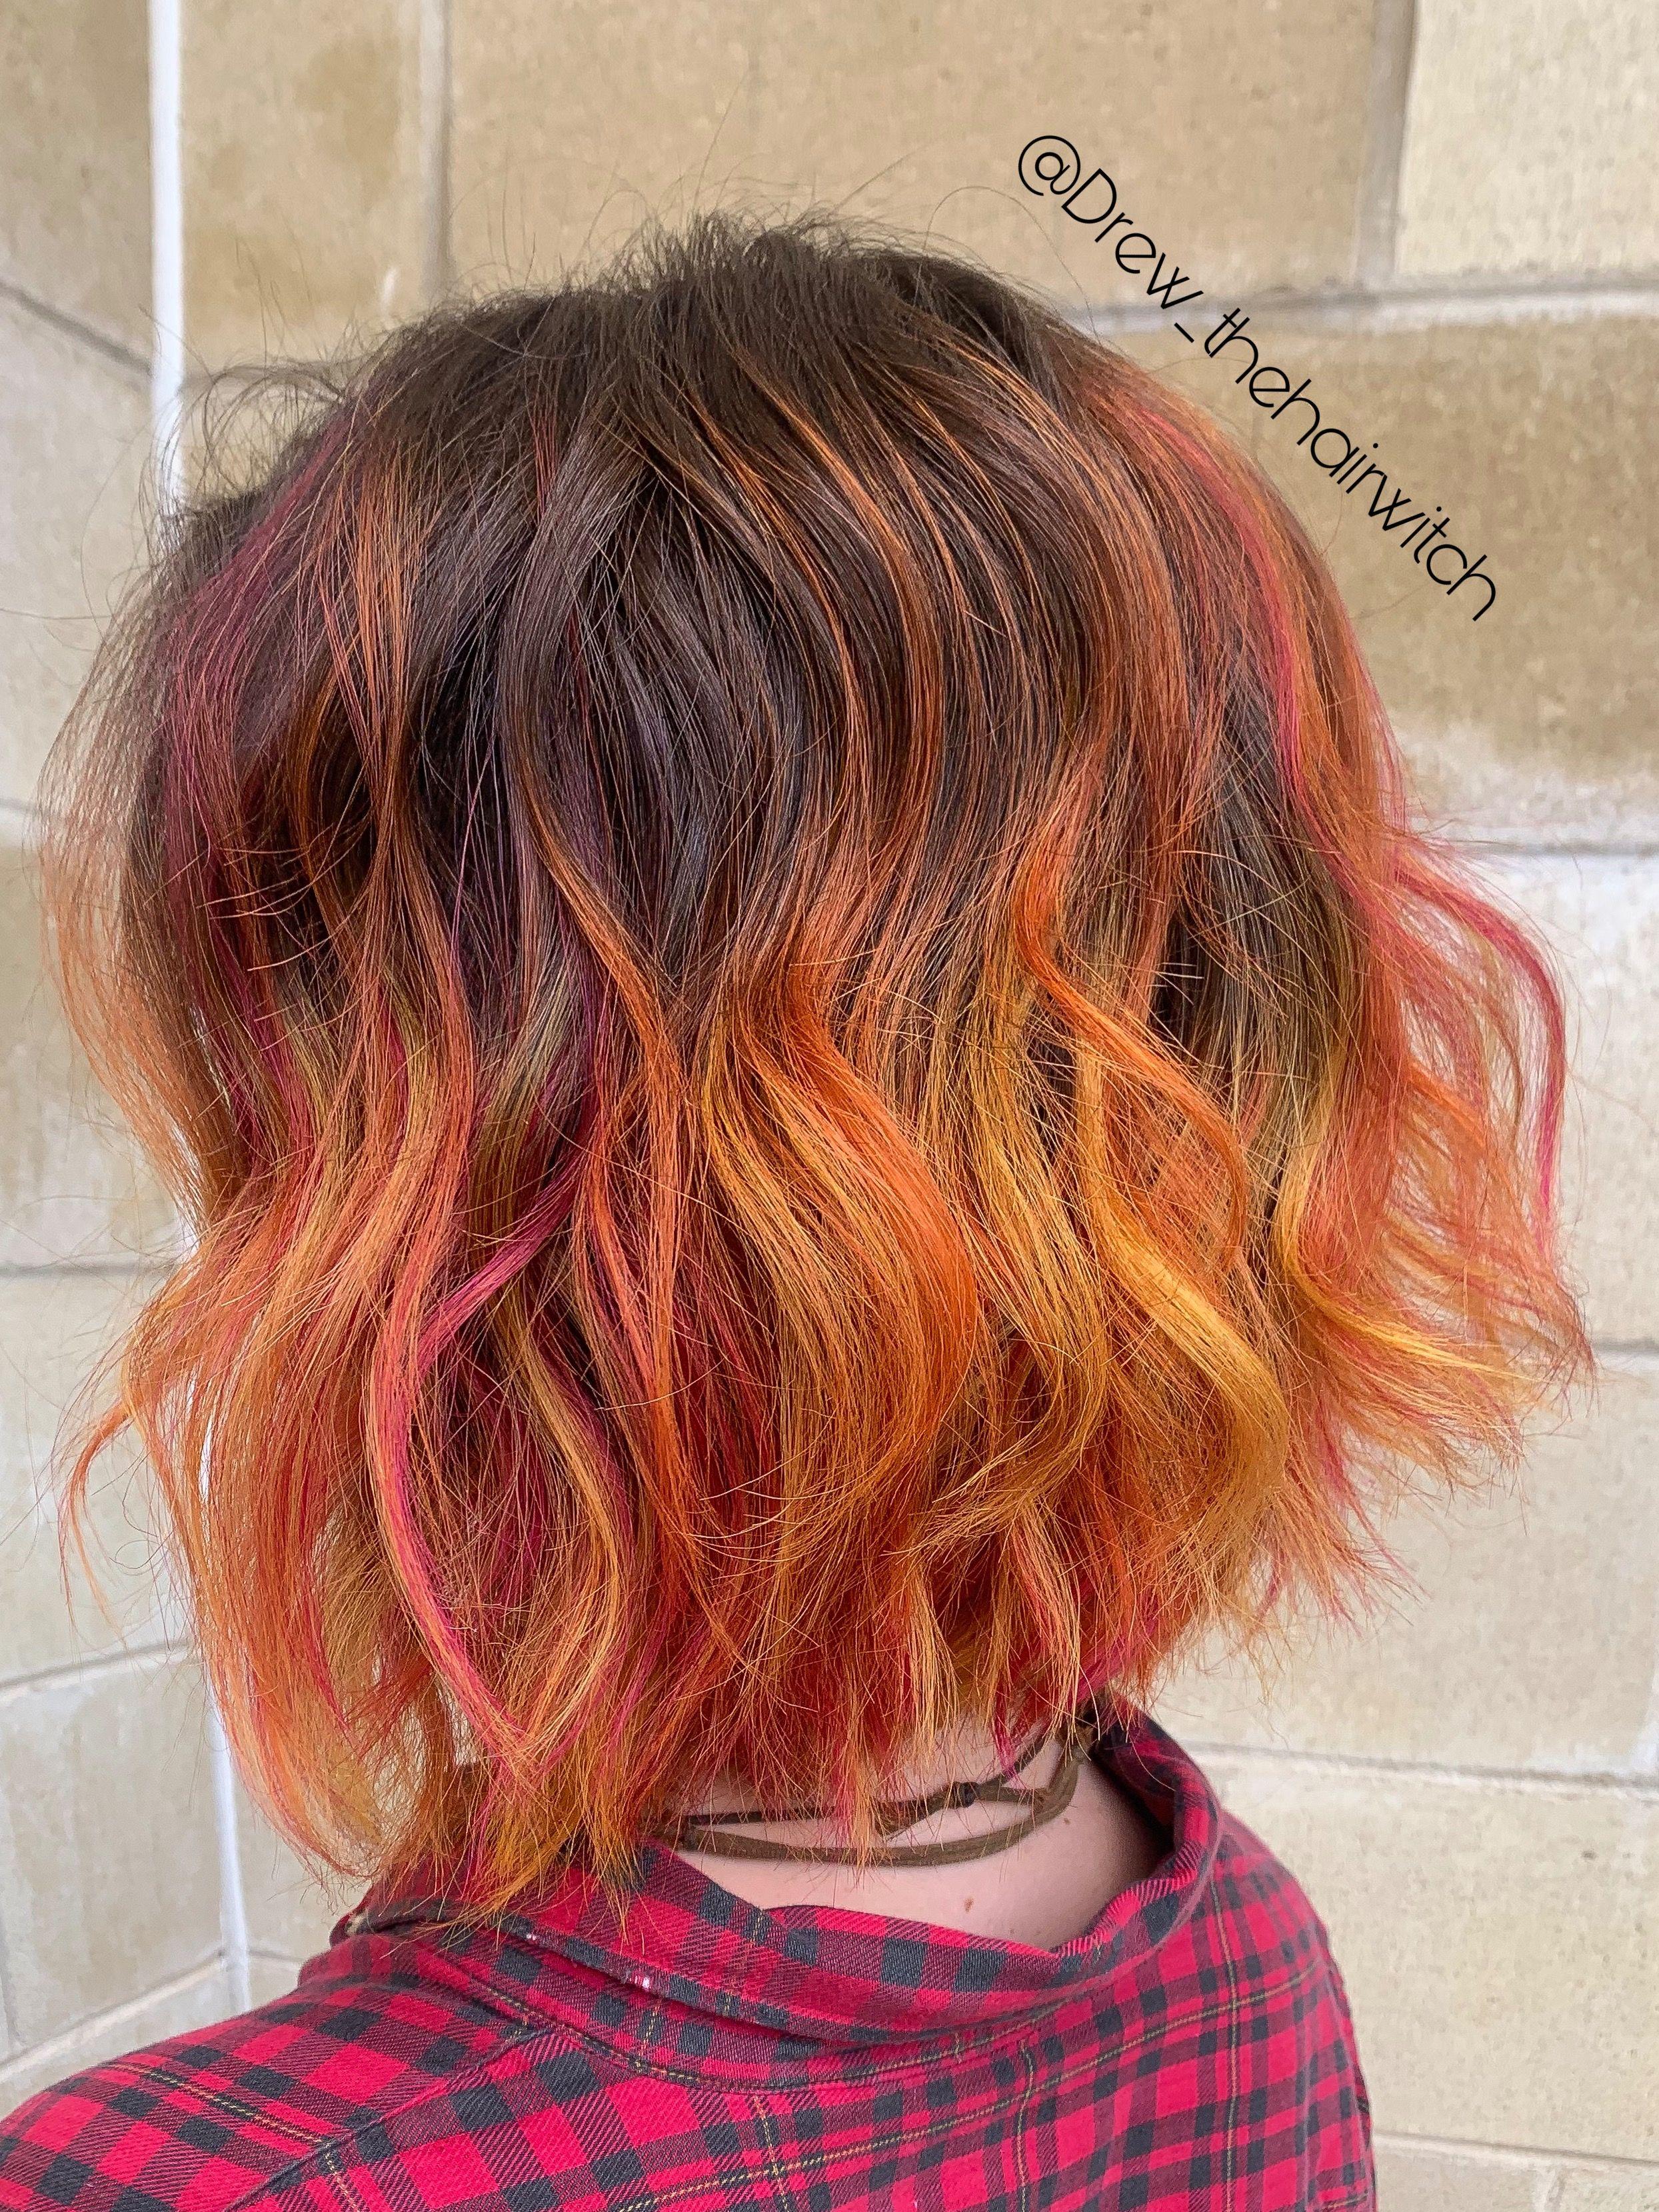 Orange Yellow And Magenta Balayage And Highlight Mix Colorfulbalayage Orangehair Yellowhair Colorfulhighlights Yellow Hair Hair Orange Highlights